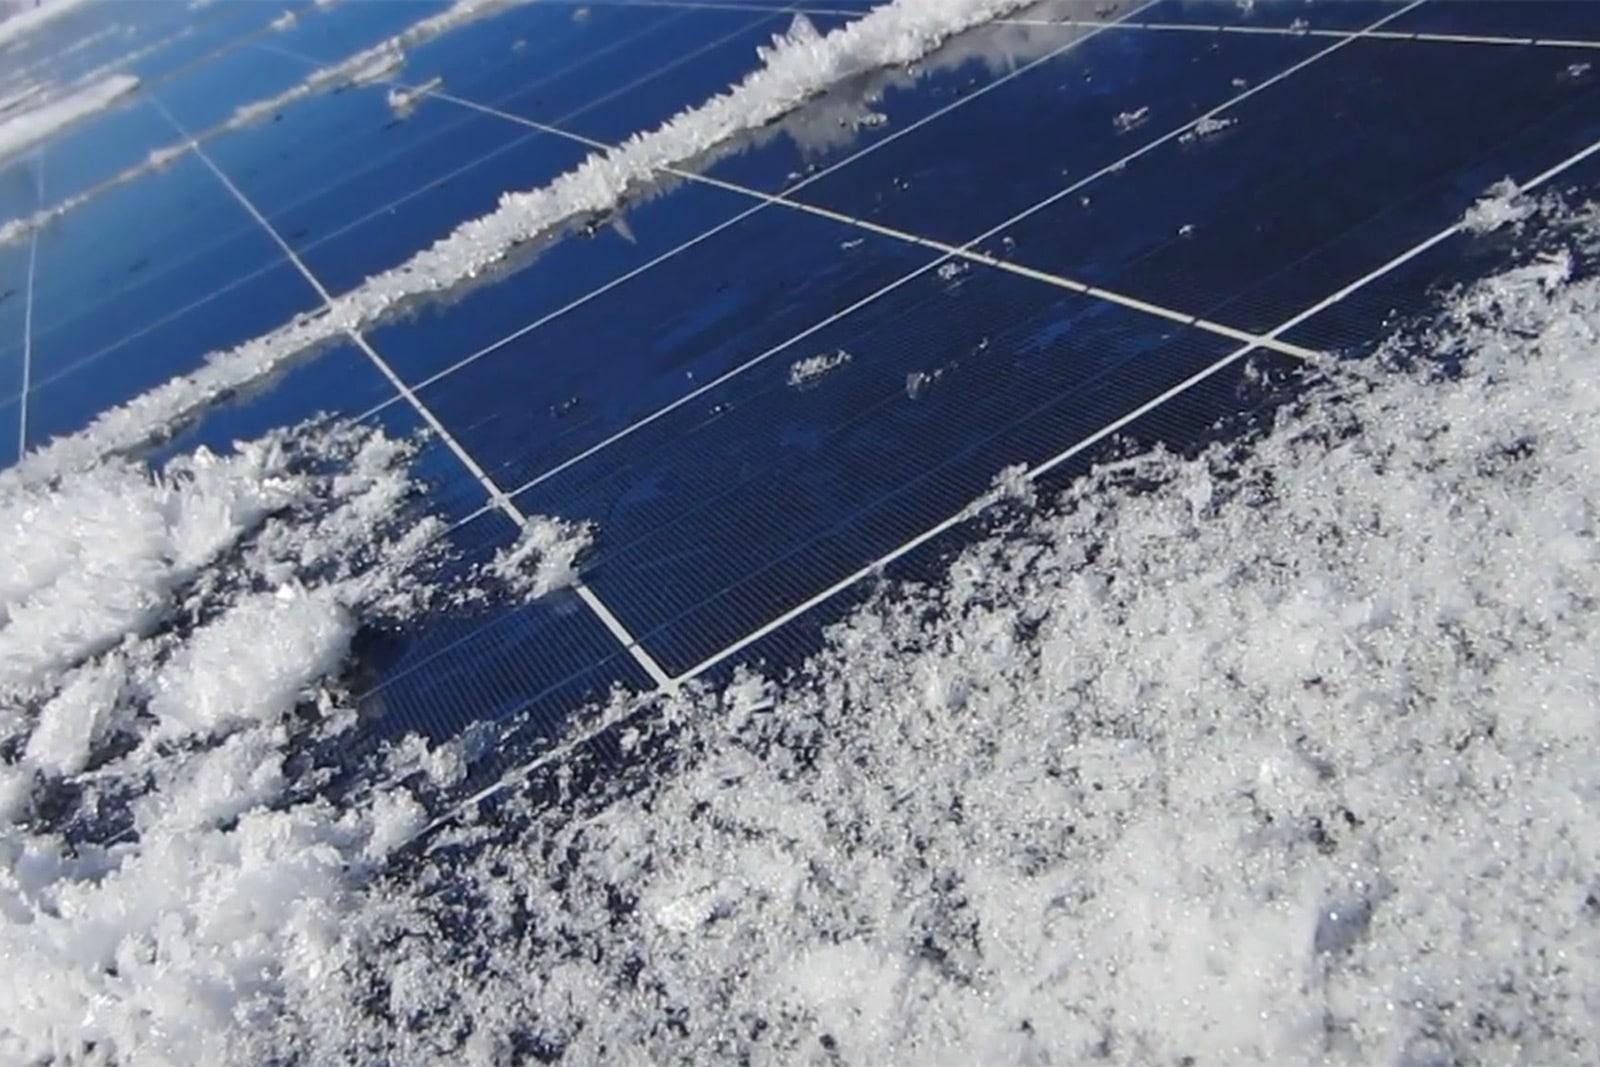 Spara sommarens solenergi till vintern